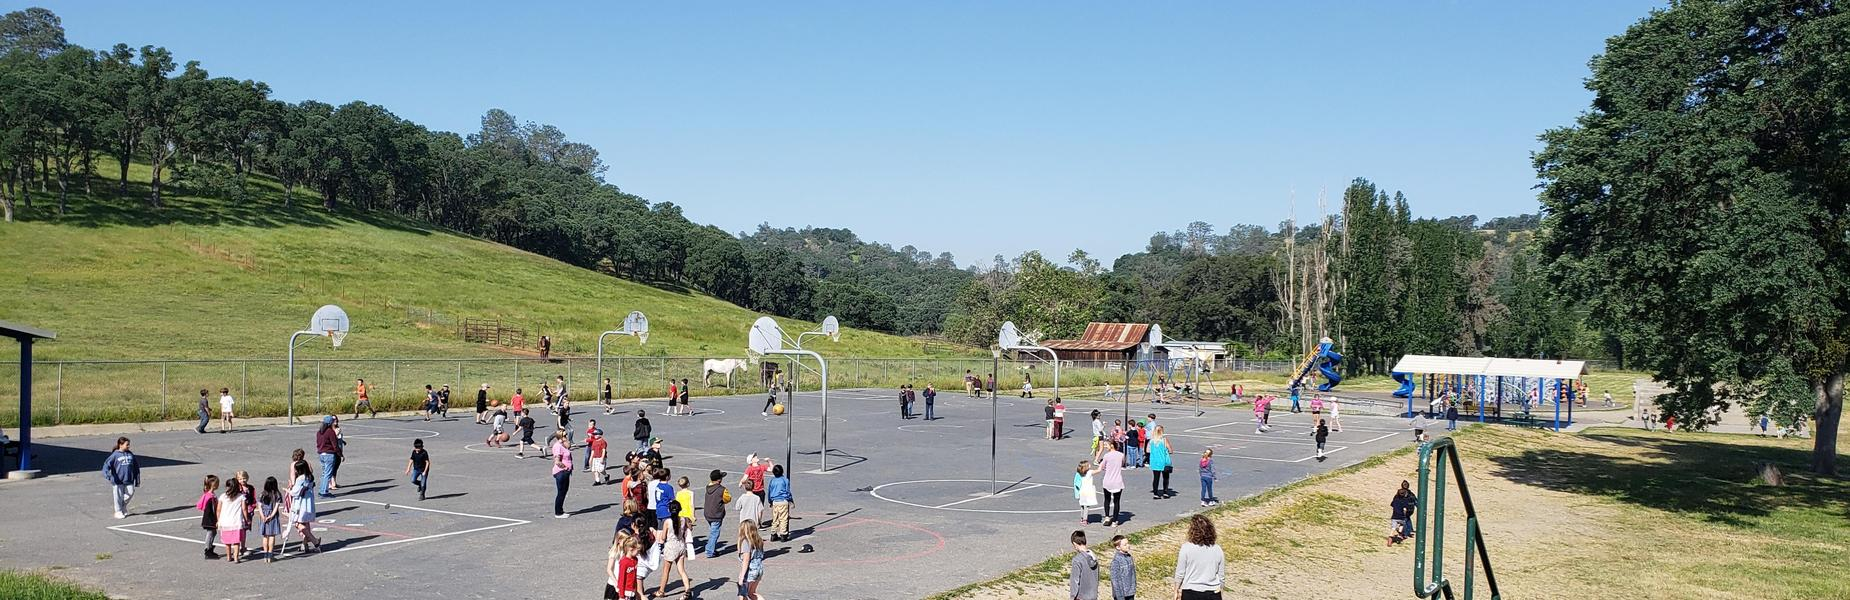 Jenny Lind Elementary Playground